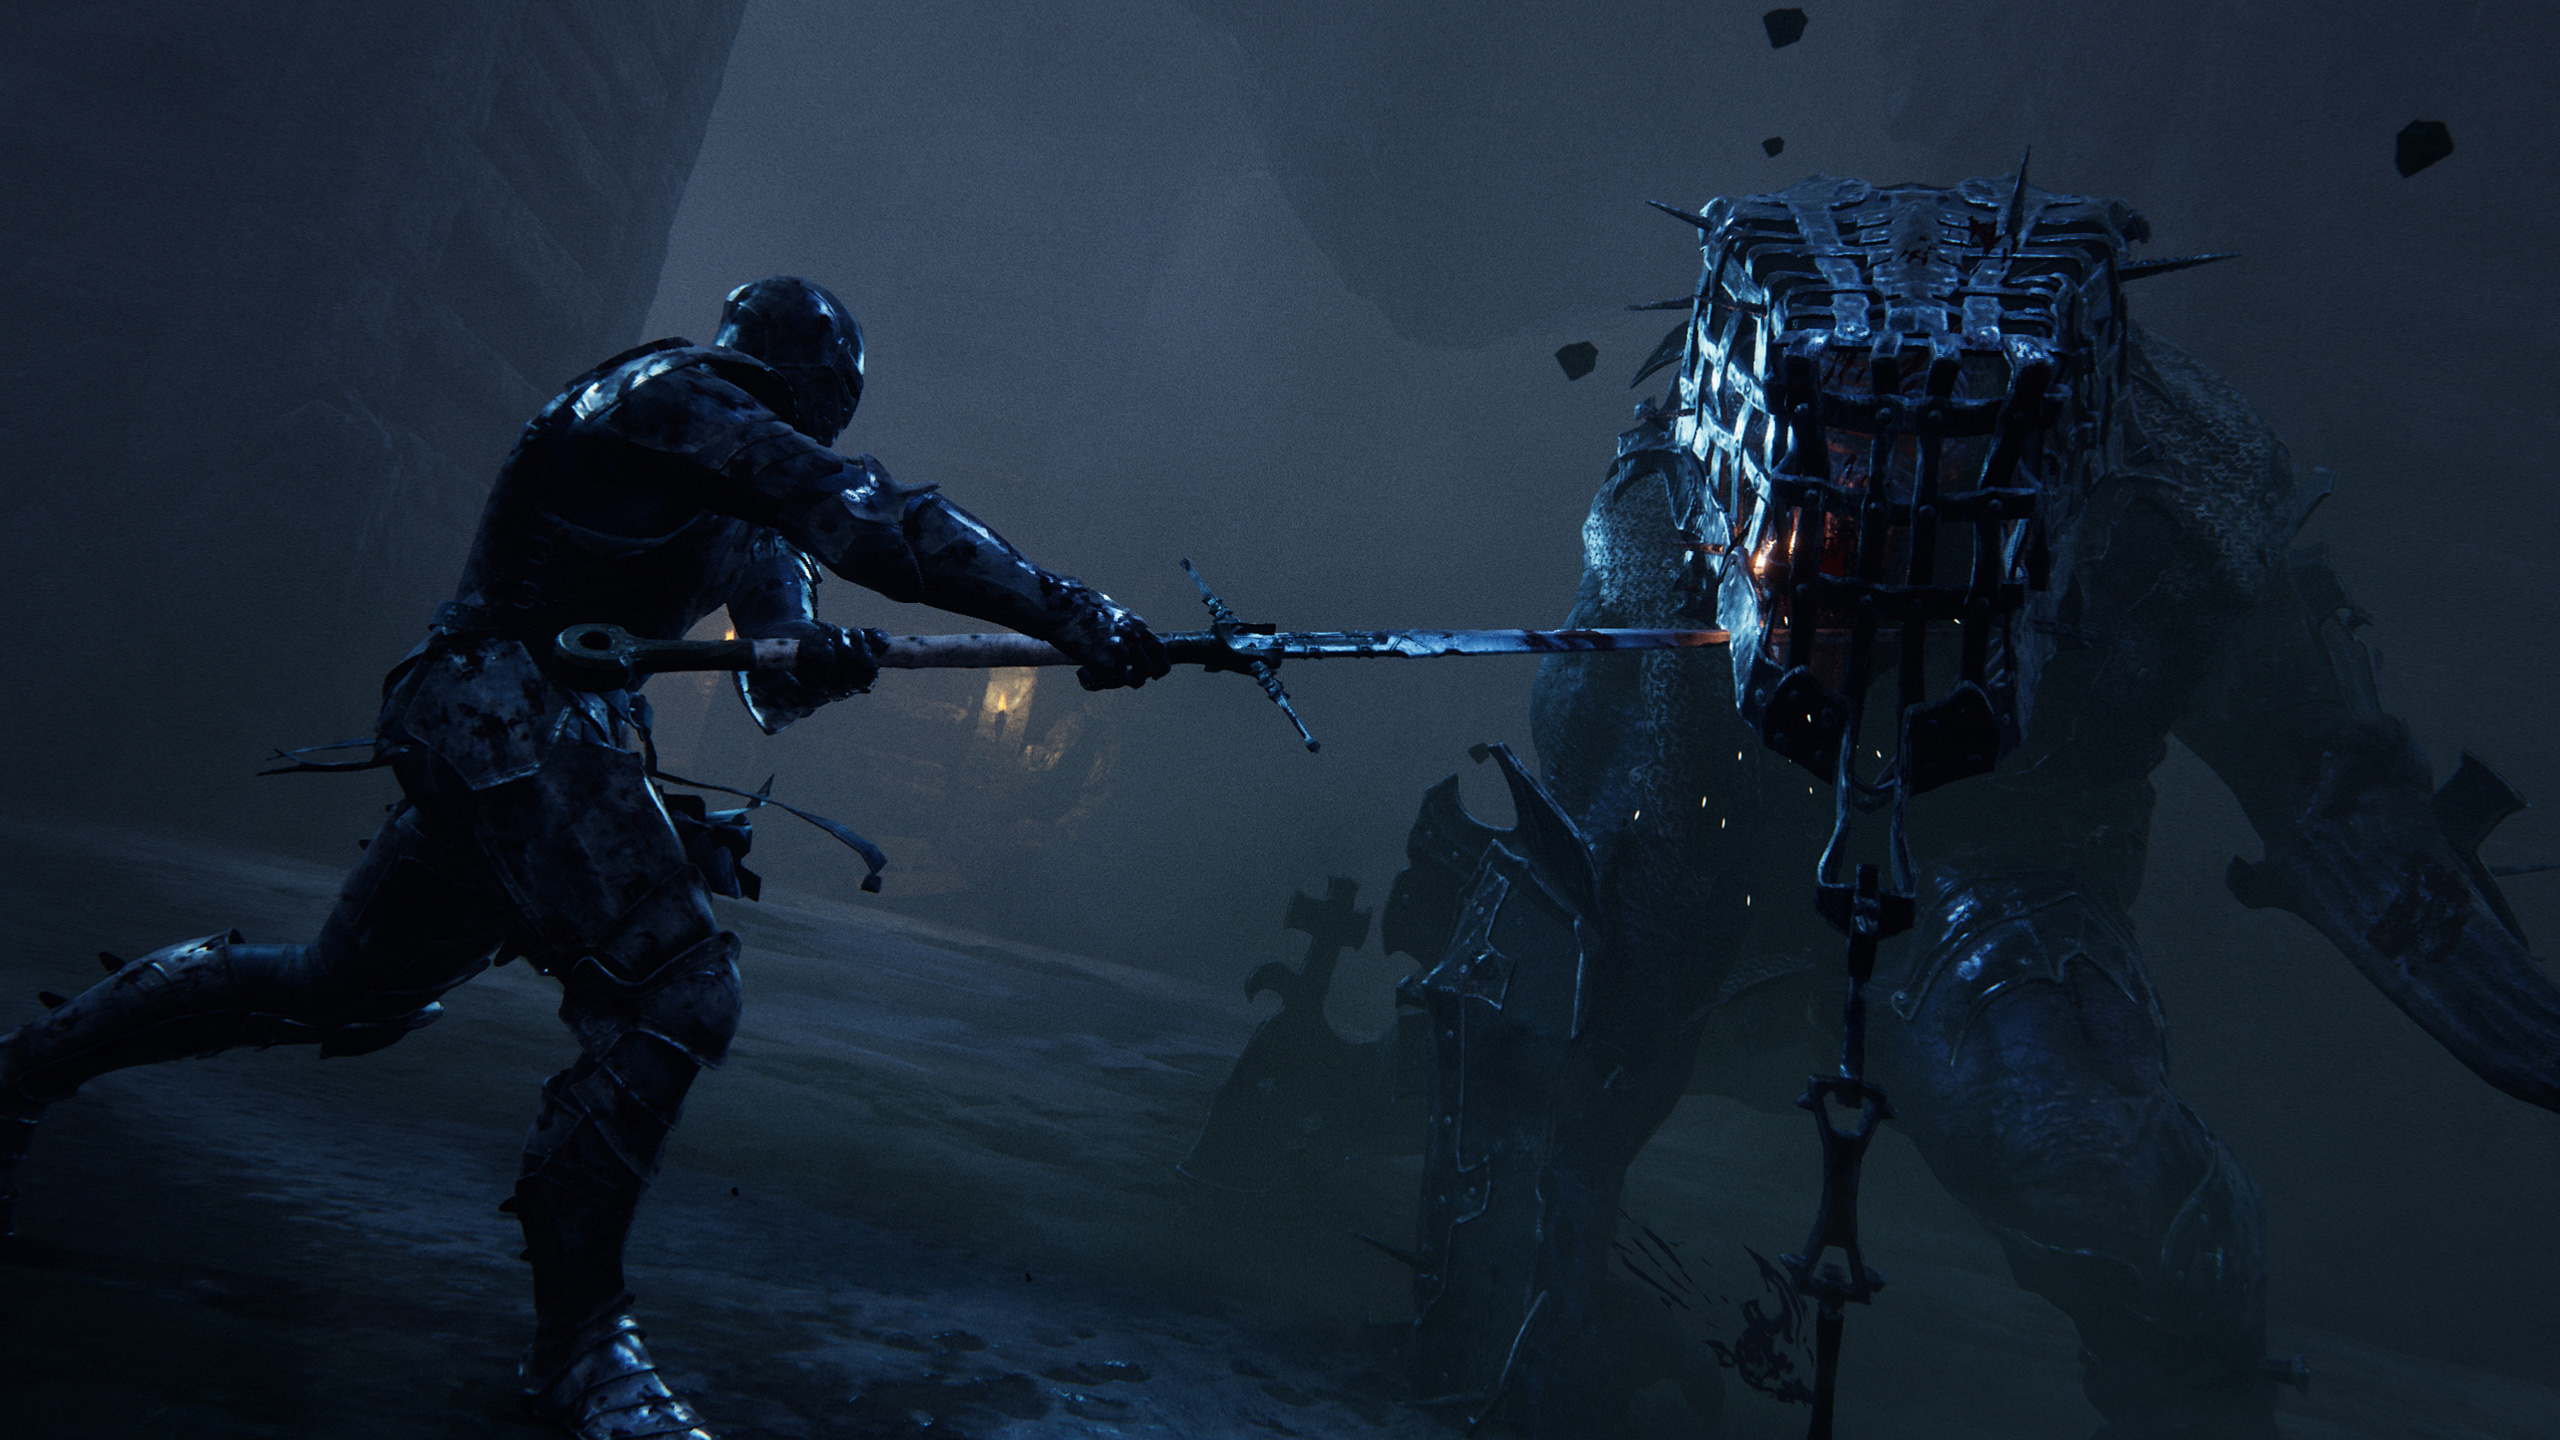 Mortal Shell is going straight on my action-RPG radar screenshot